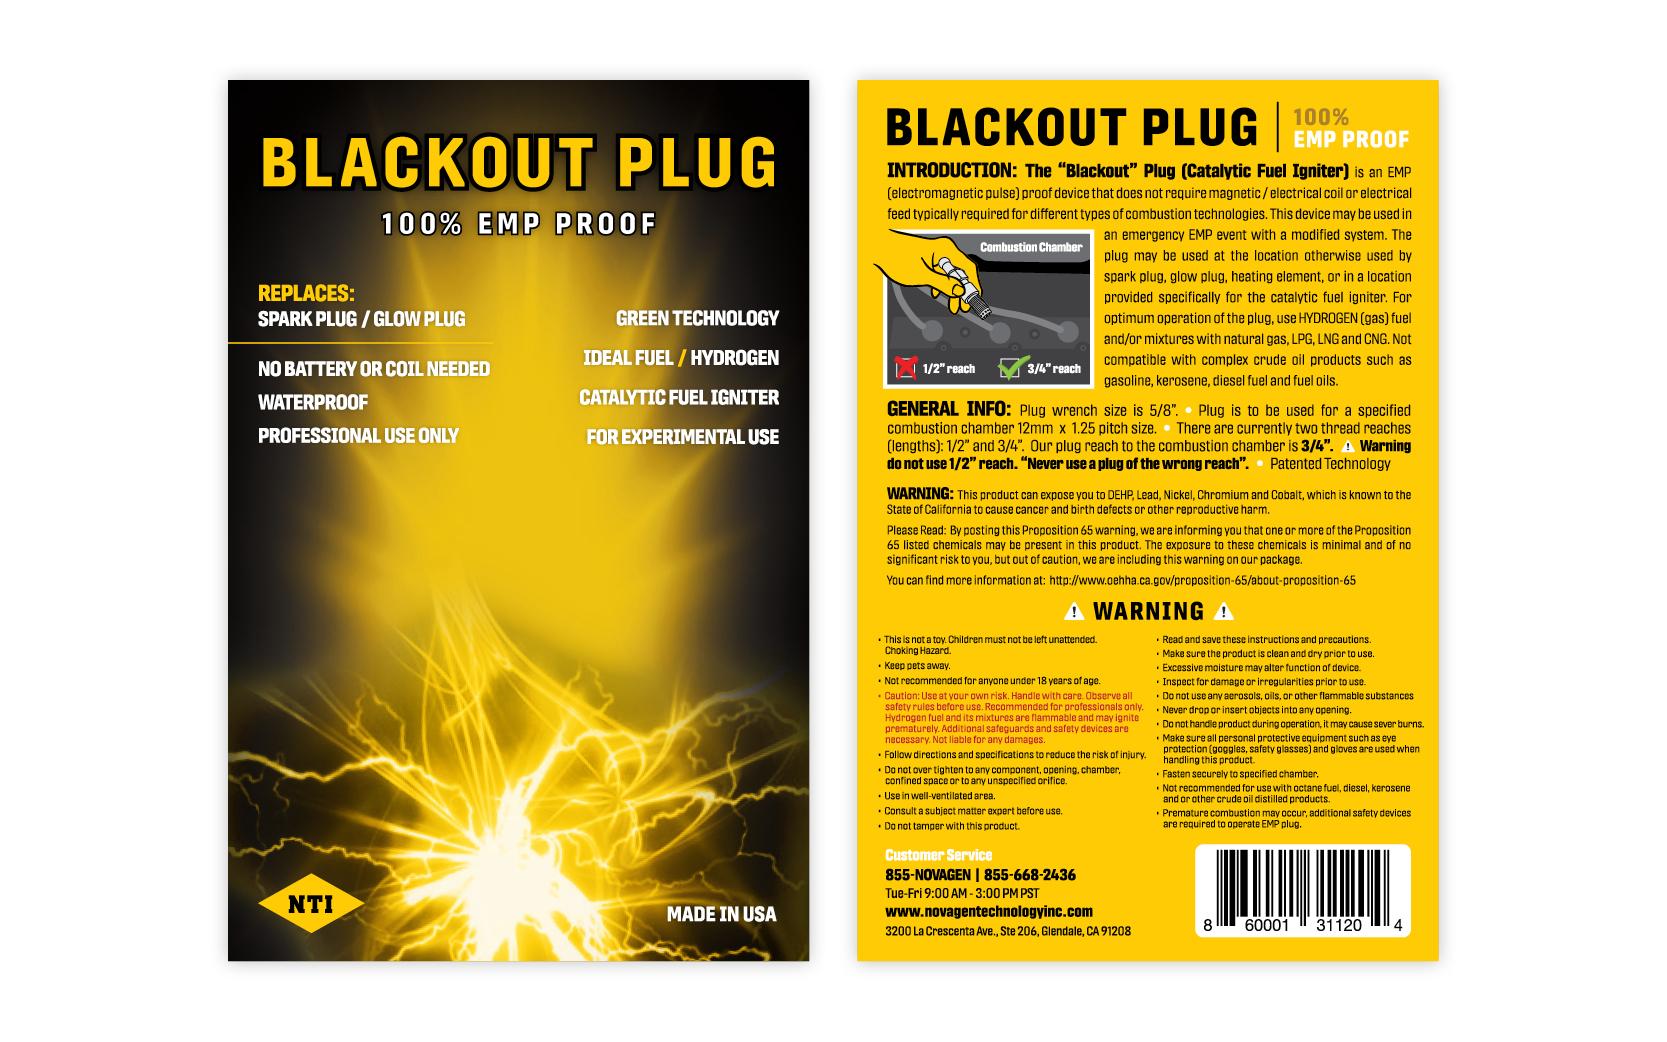 NTI | Blackout Plug Packaging